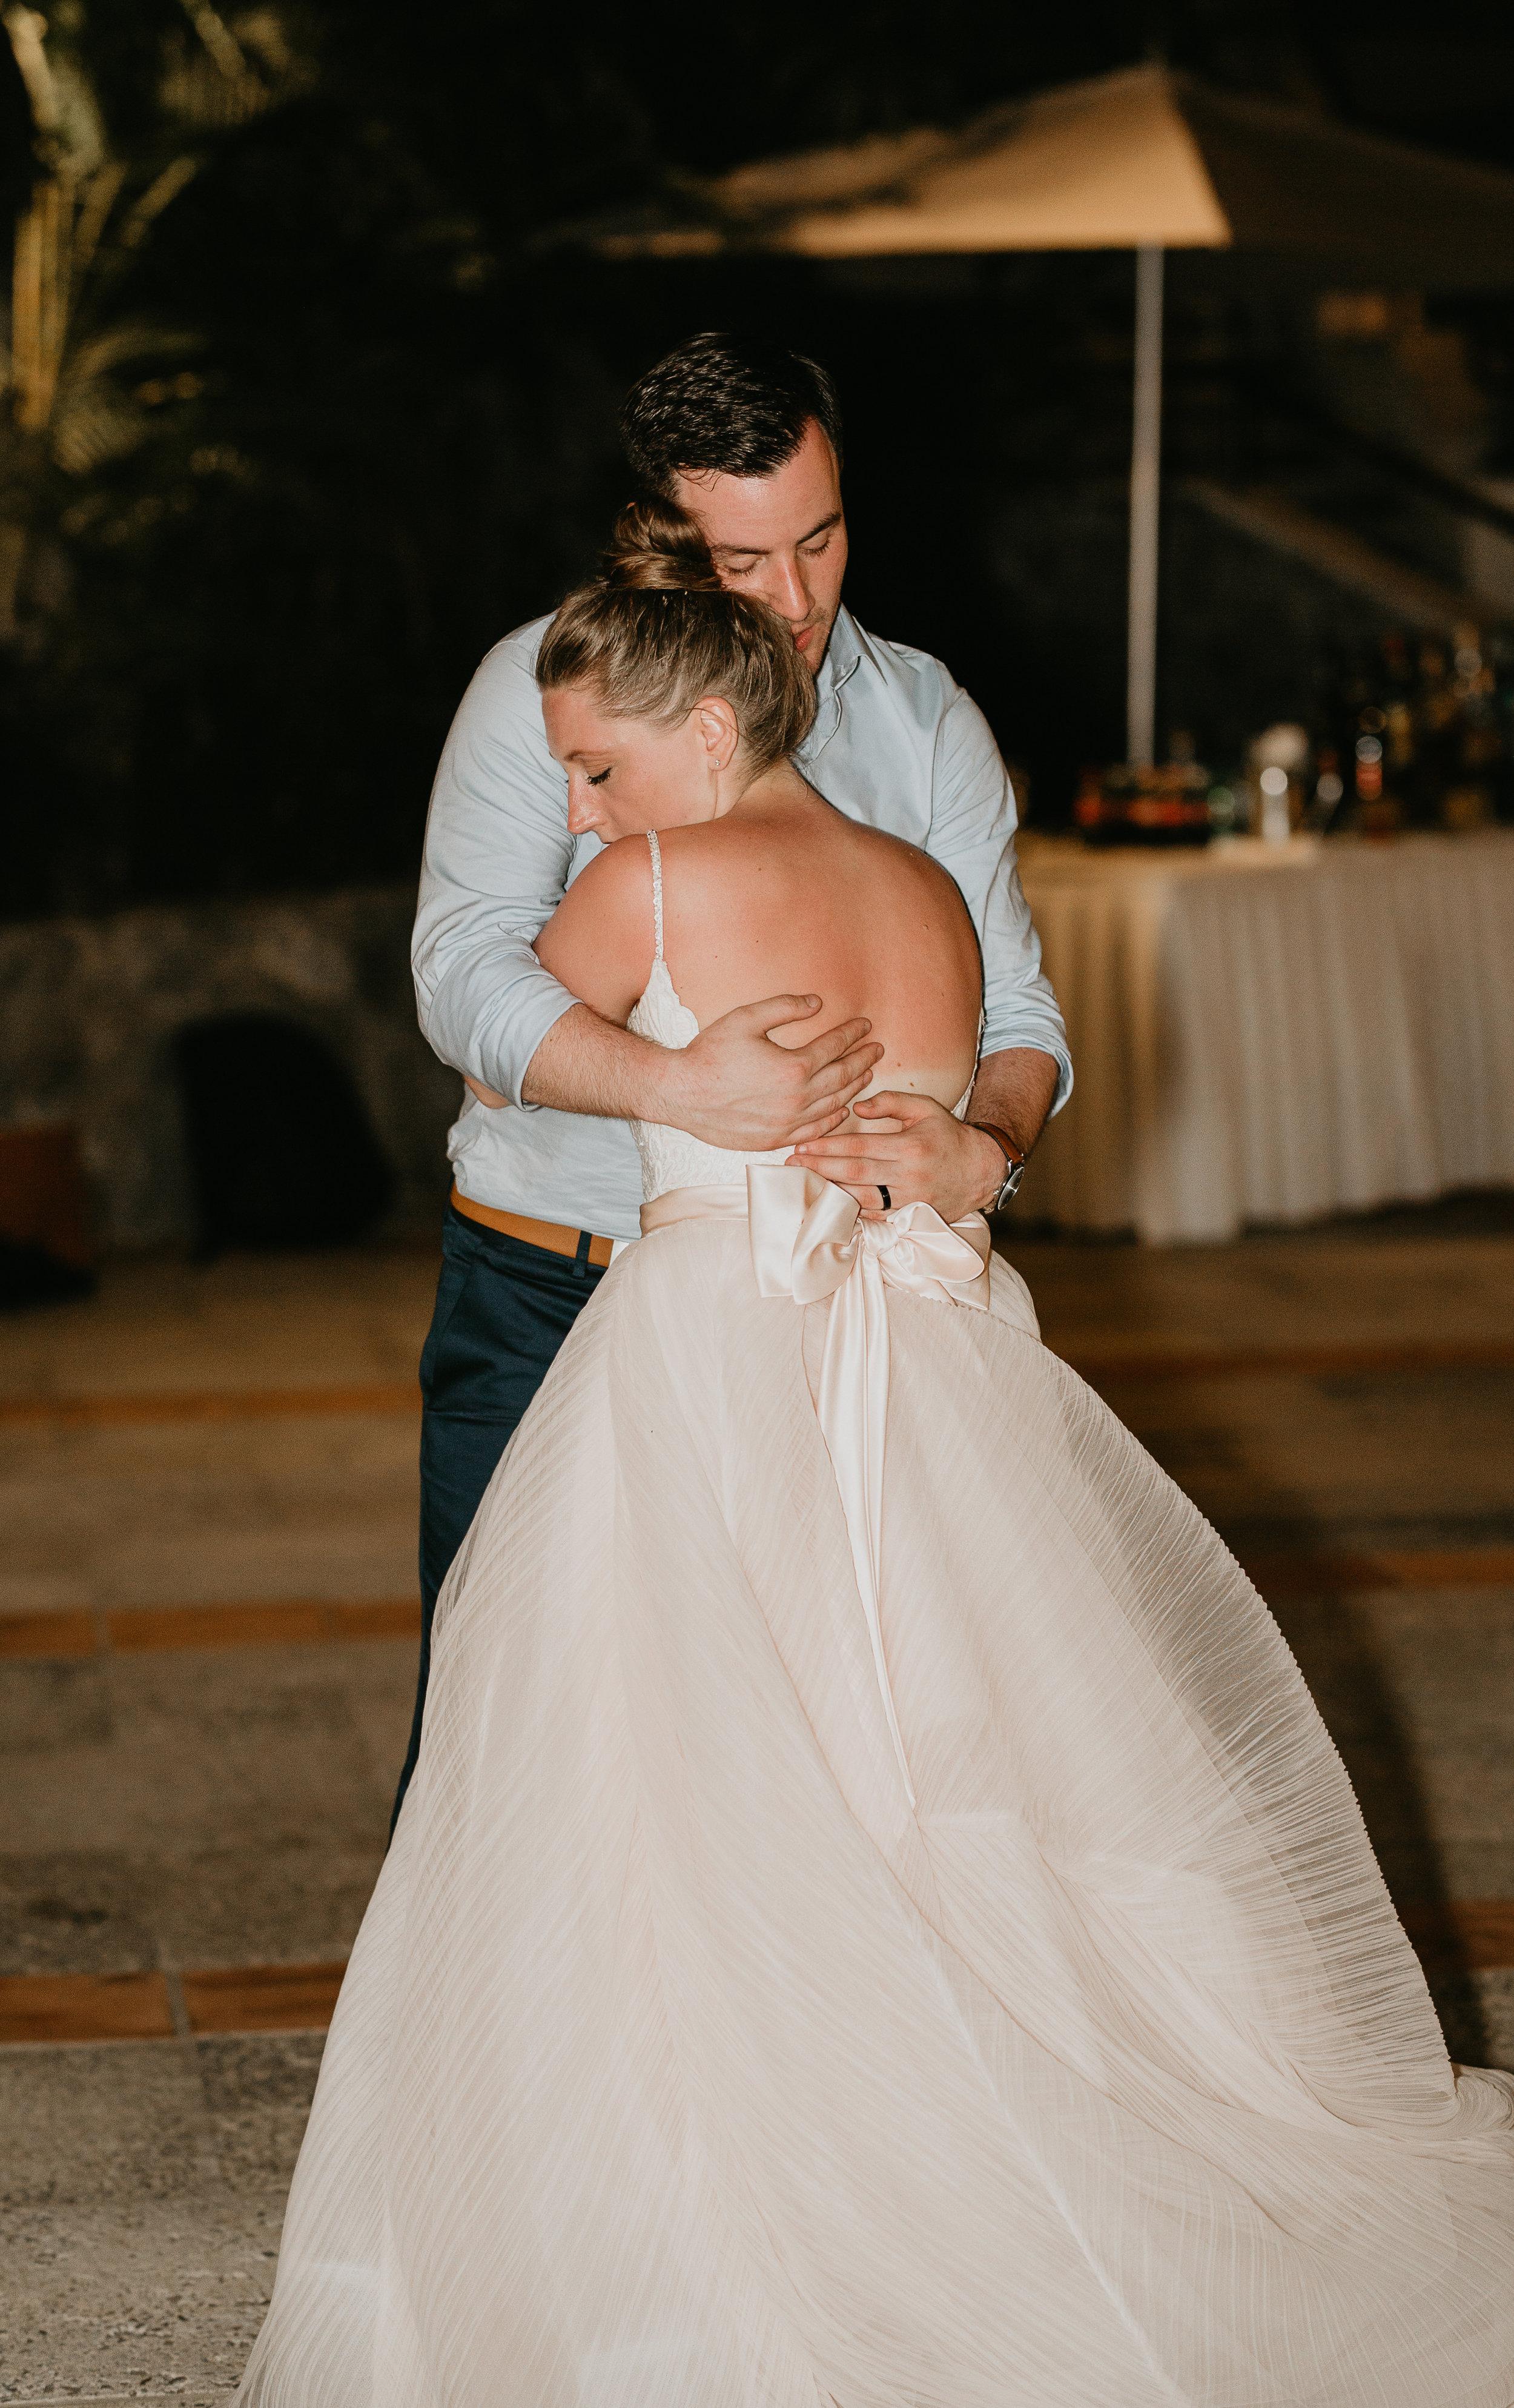 nicole-daacke-photography-destination-wedding-in-st-lucia-sandals-la-toc-intimate-island-wedding-carribean-elopement-photographer-chill-island-wedding-166.jpg